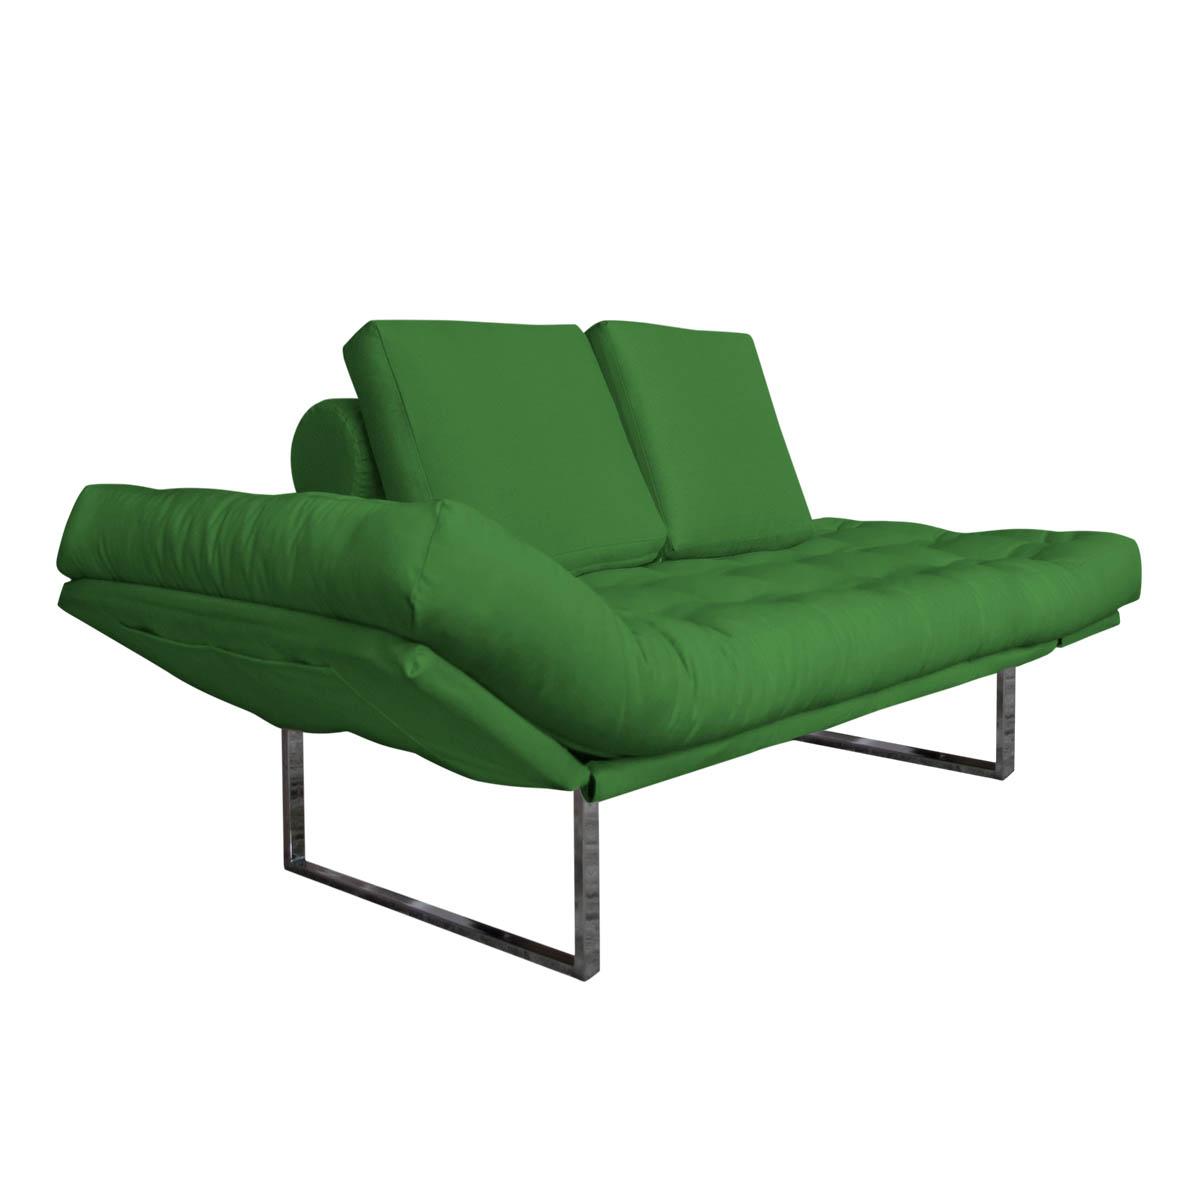 Sofa cama 2 lugares futon company for Sofa cama 2 plazas chile